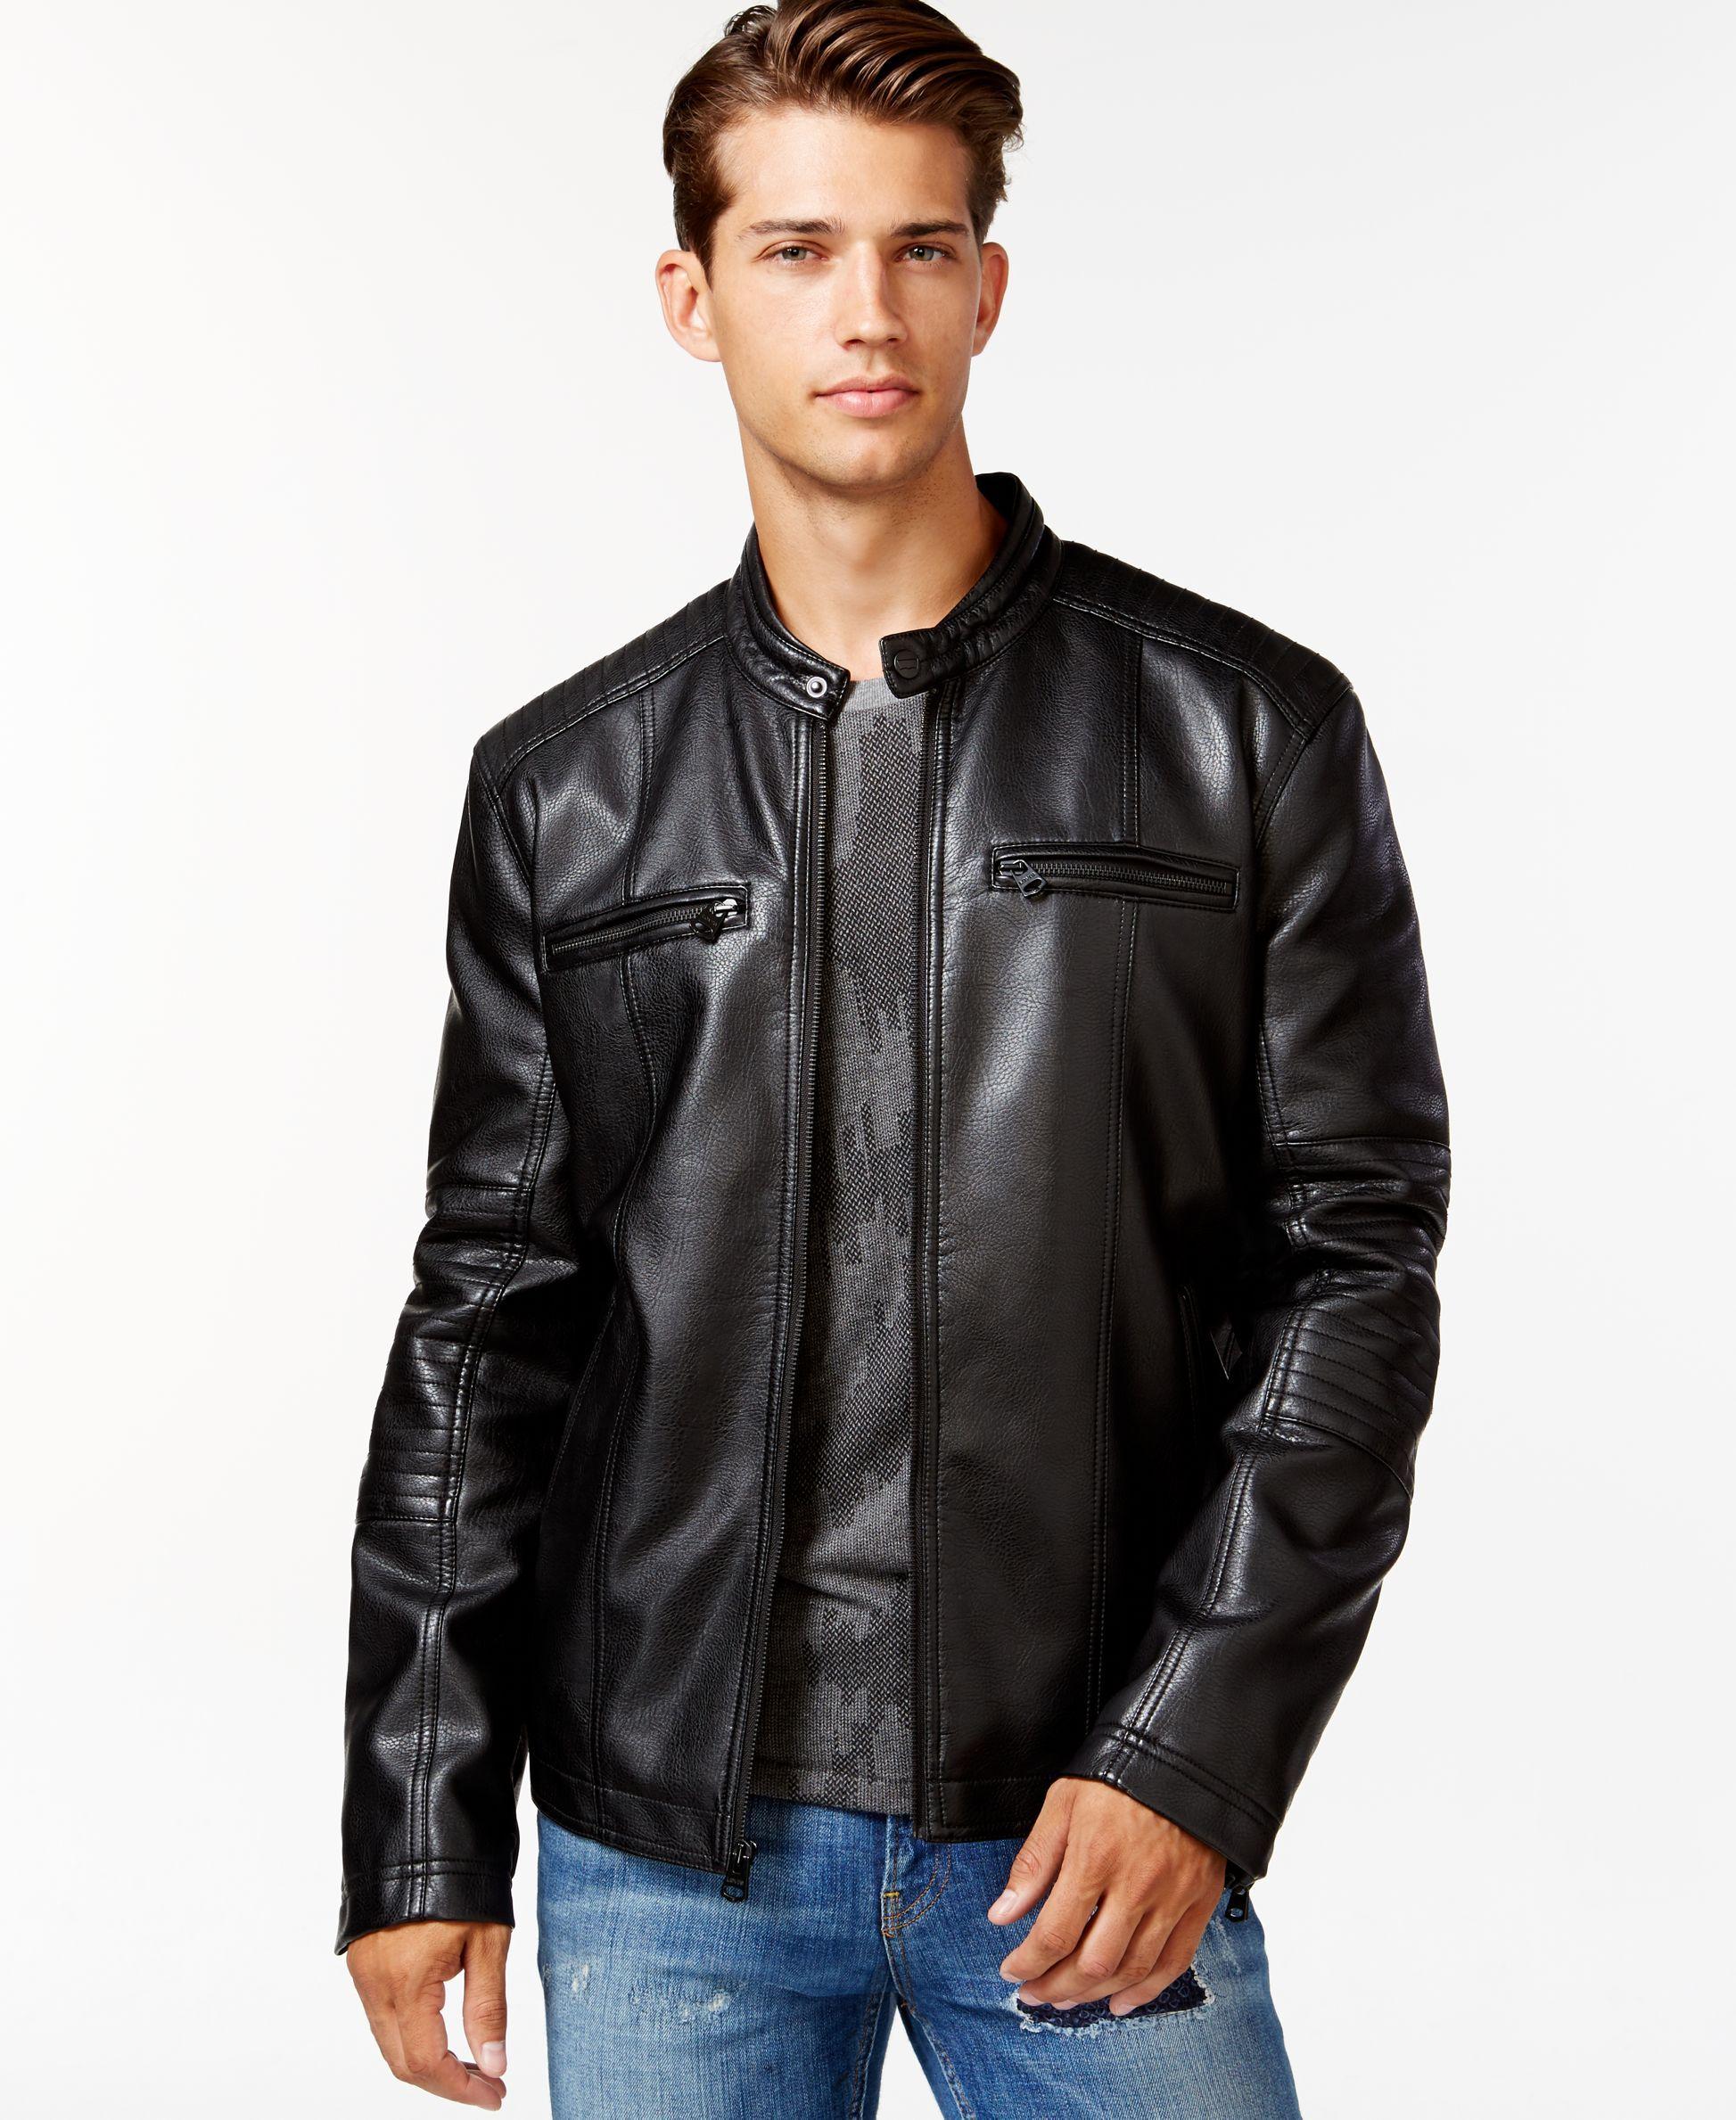 Levi's Racer FauxLeather Jacket Leather jacket, Mens